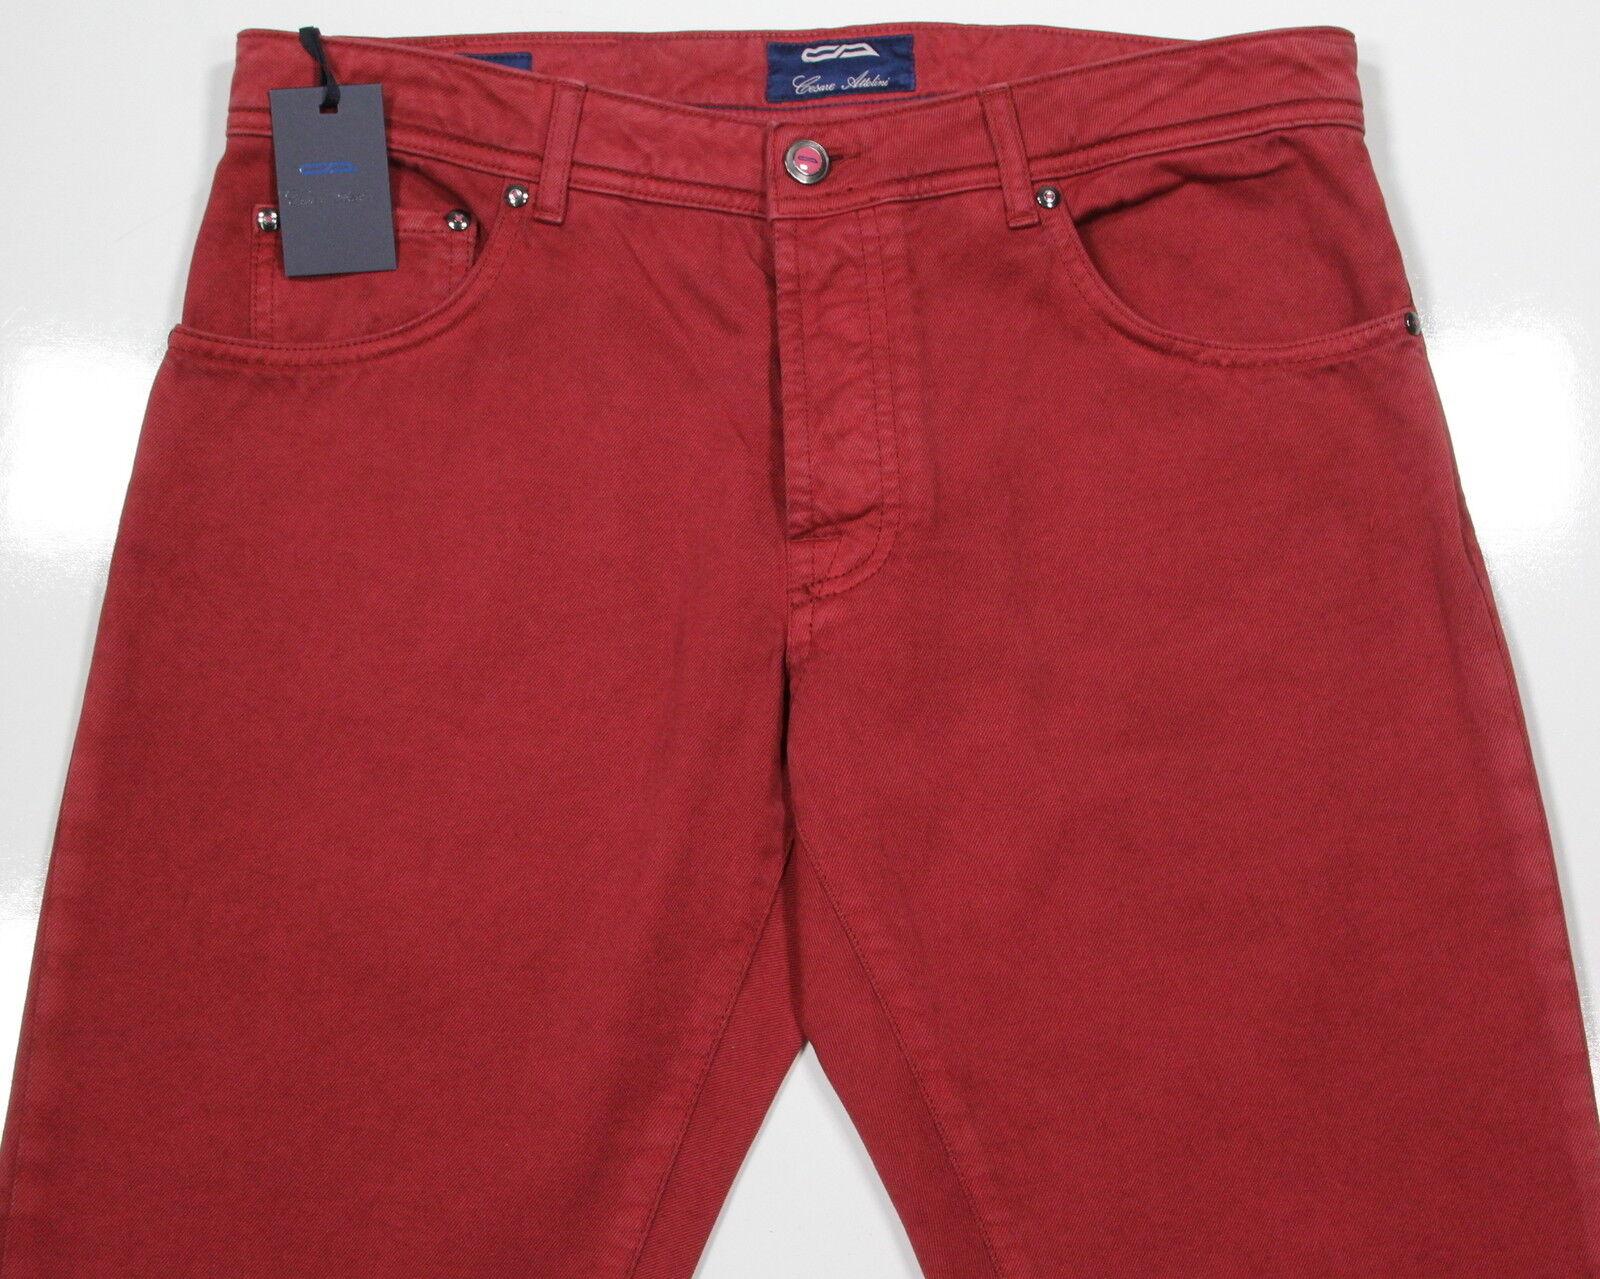 Neuf Cesare Cesare Neuf Attolini Actuel 2018 Canneberge Rouge Coton Extensible Jeans 34 53ebdd